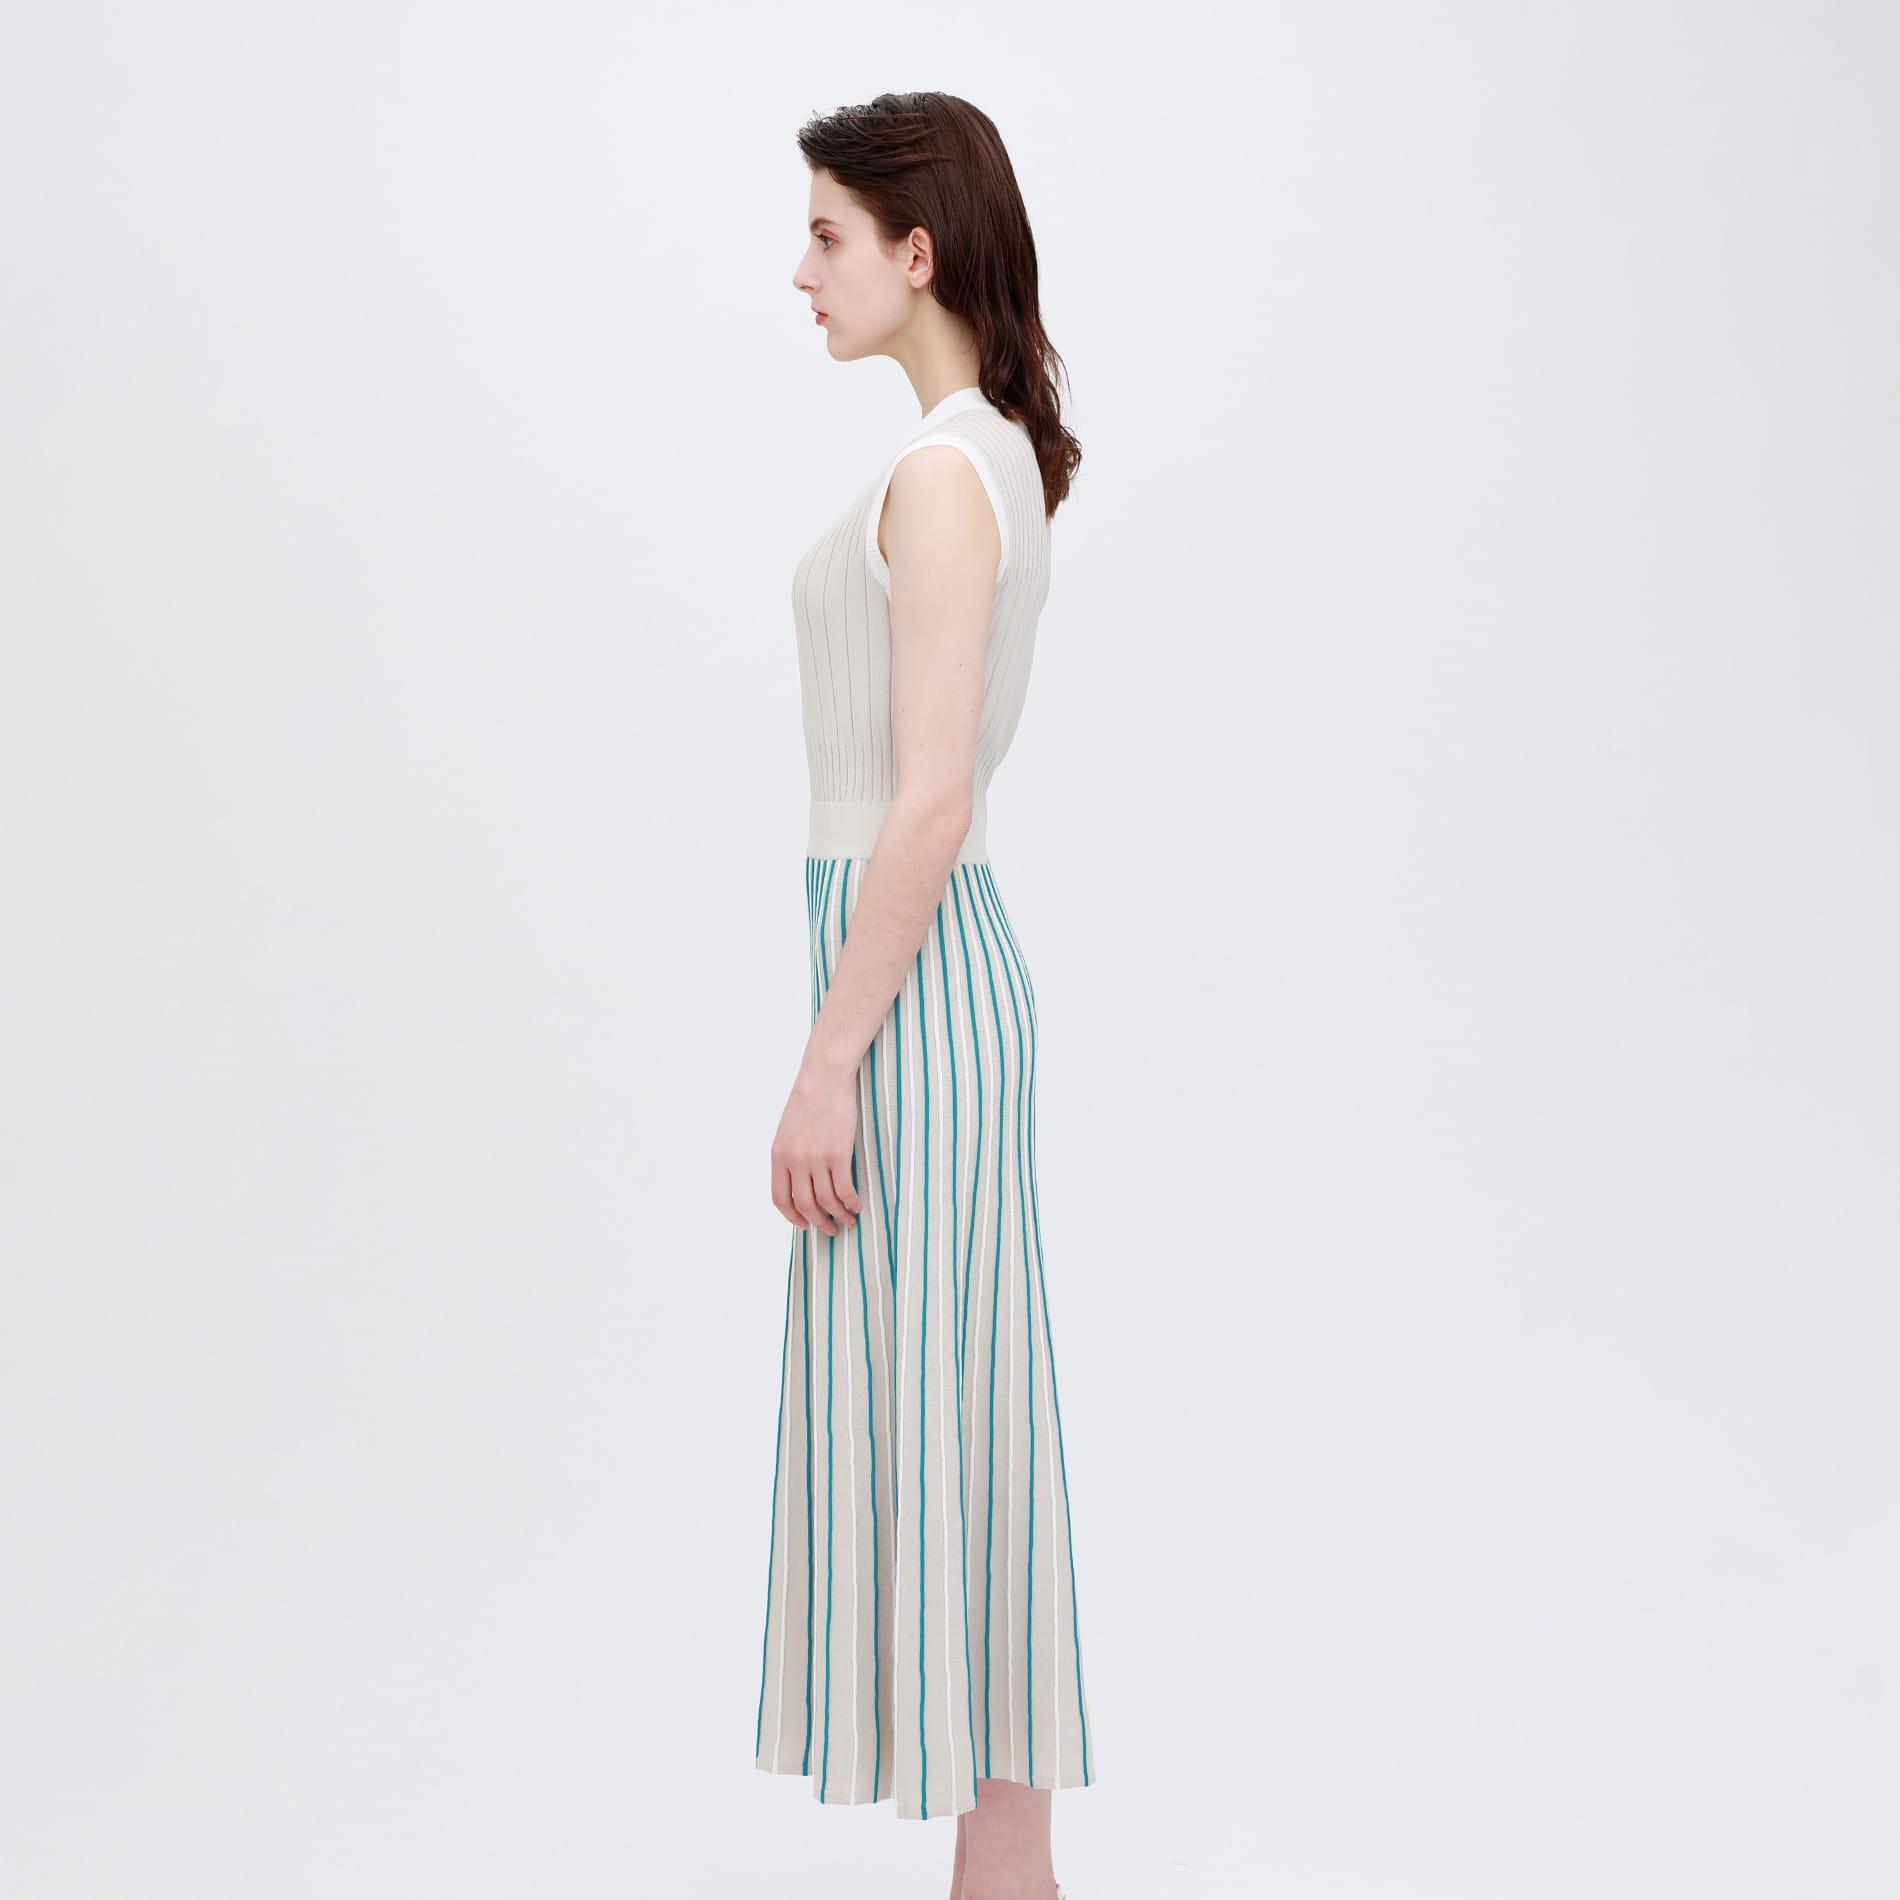 【otona MUSE掲載商品】ストライプ ブロッキング ニットドレス